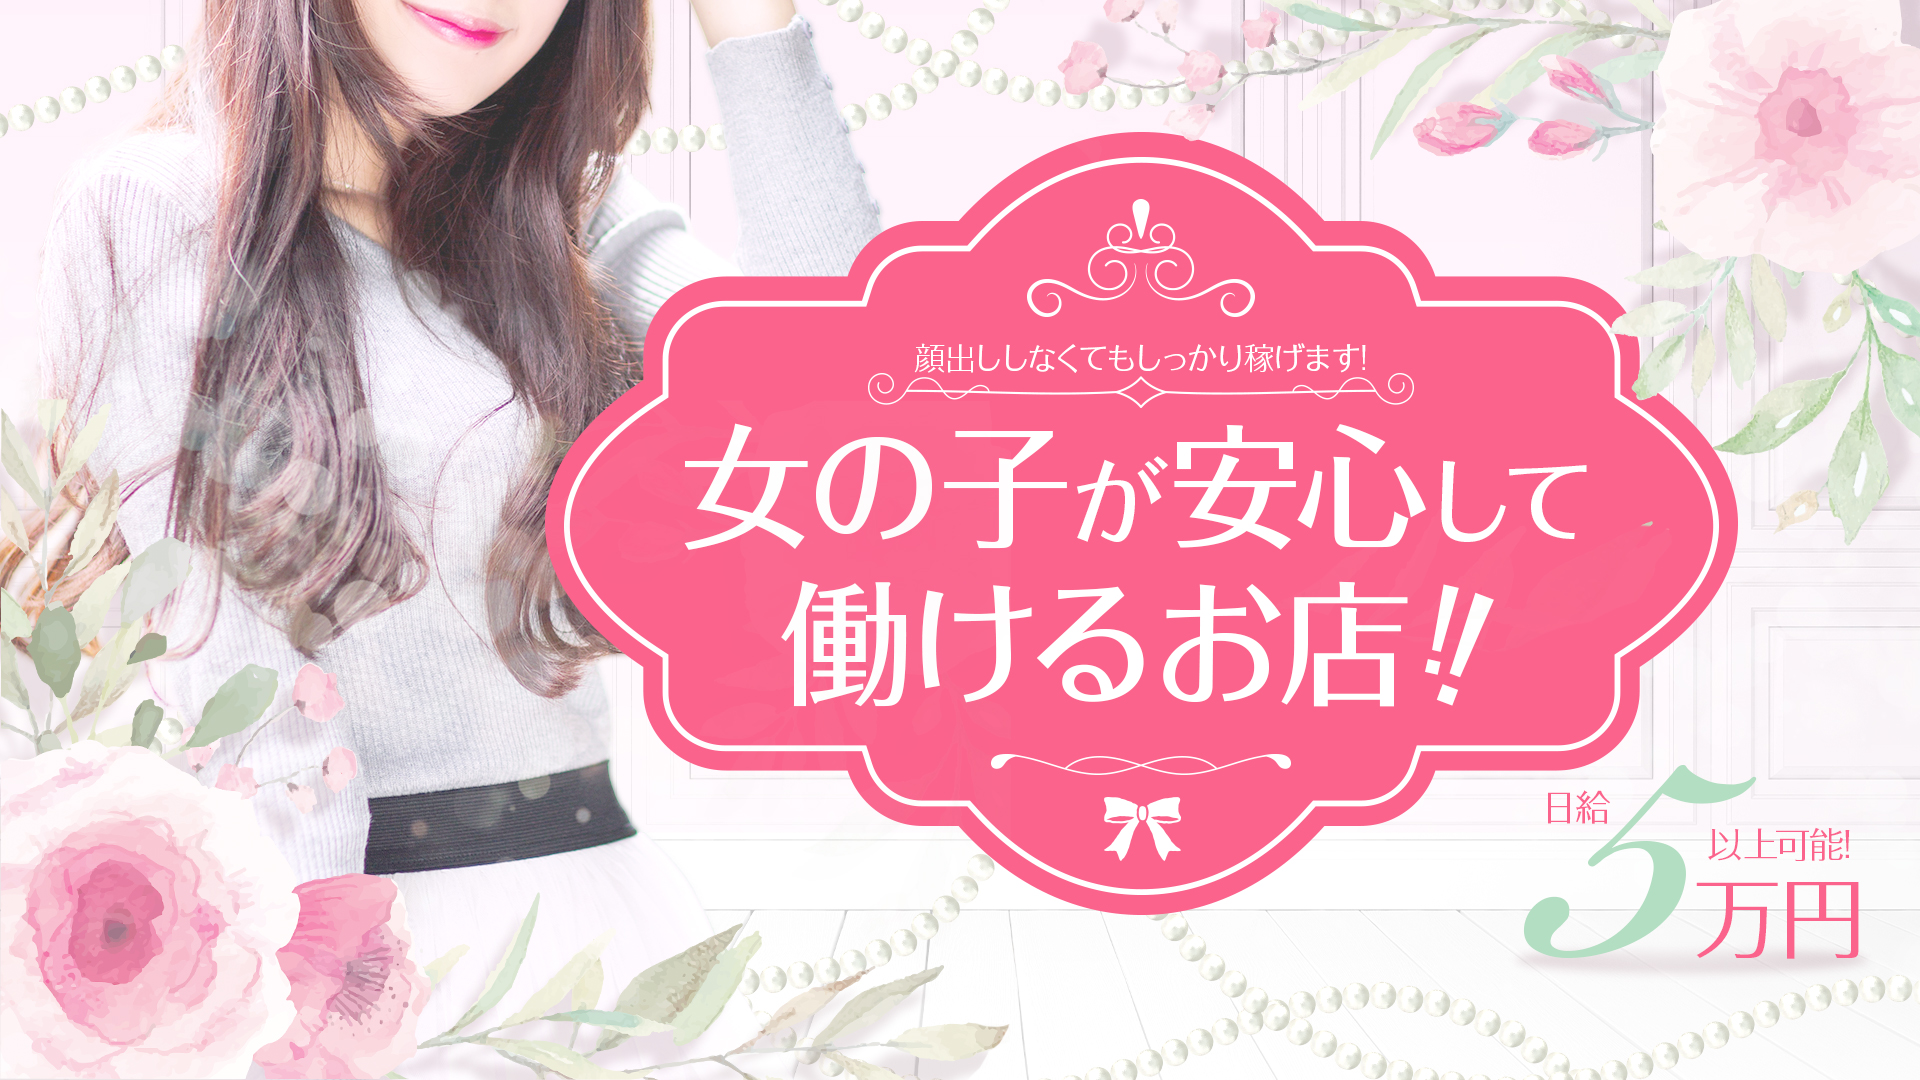 rasp berry hiroshima(ラズベリー広島)の求人画像